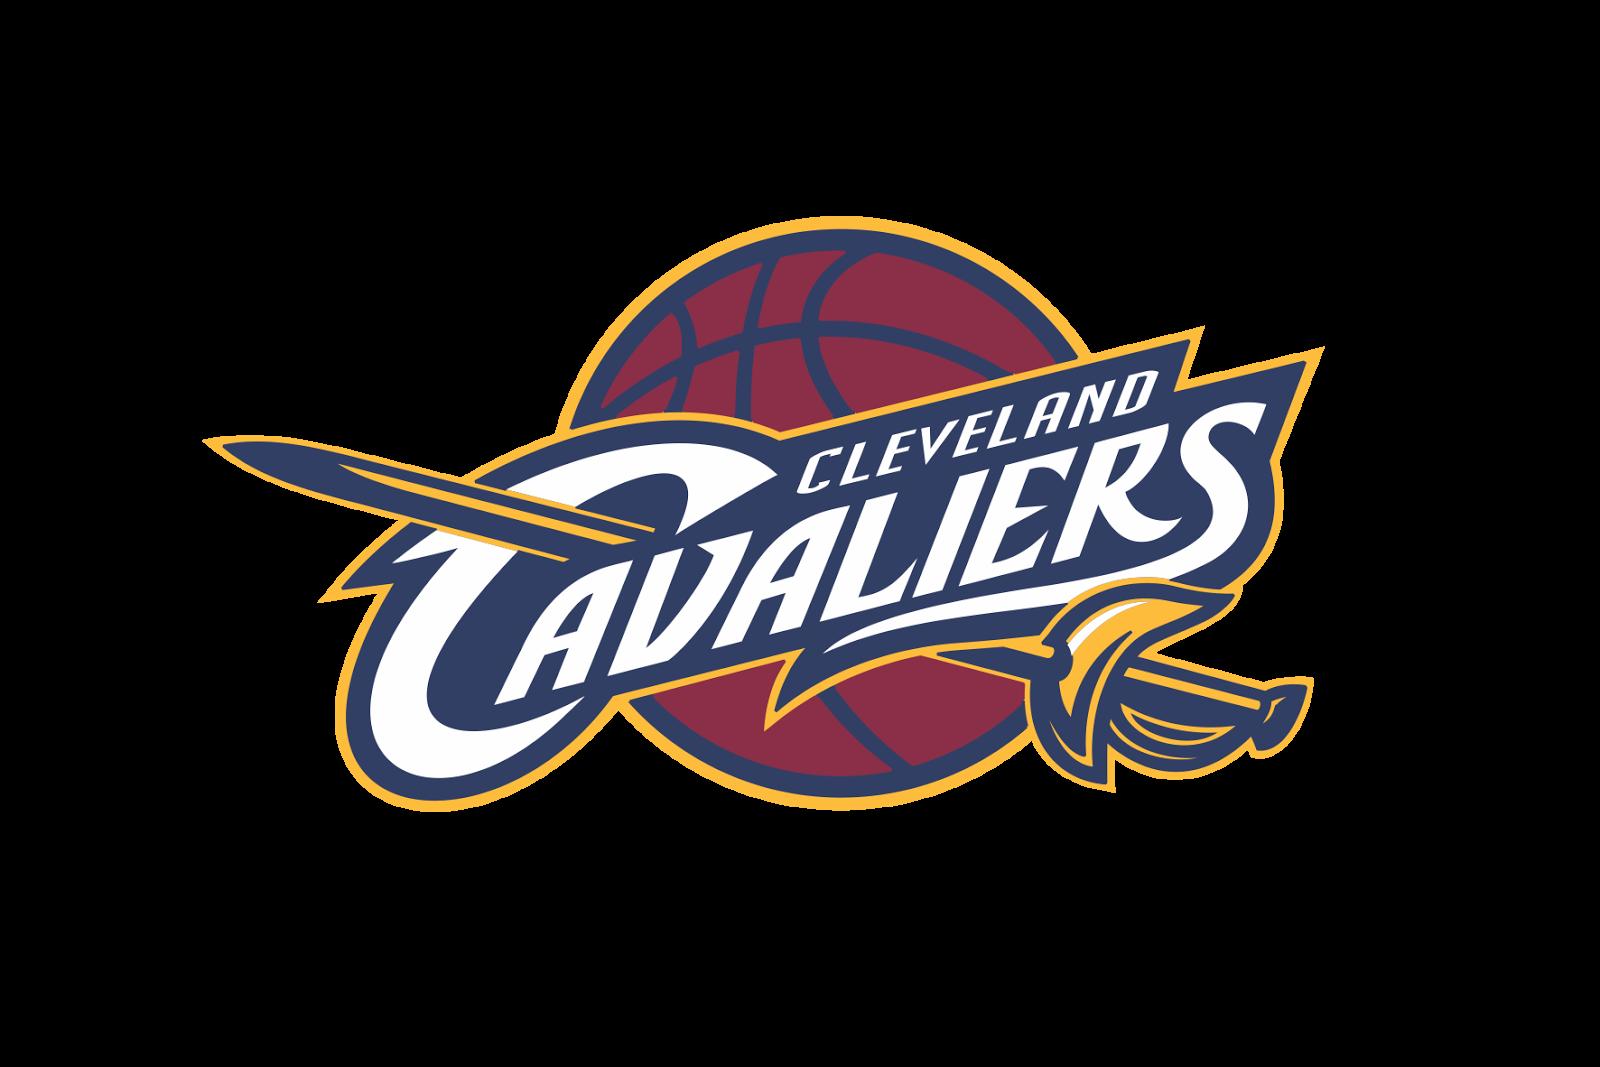 Cleveland Cavaliers: Cleveland Cavaliers Logo